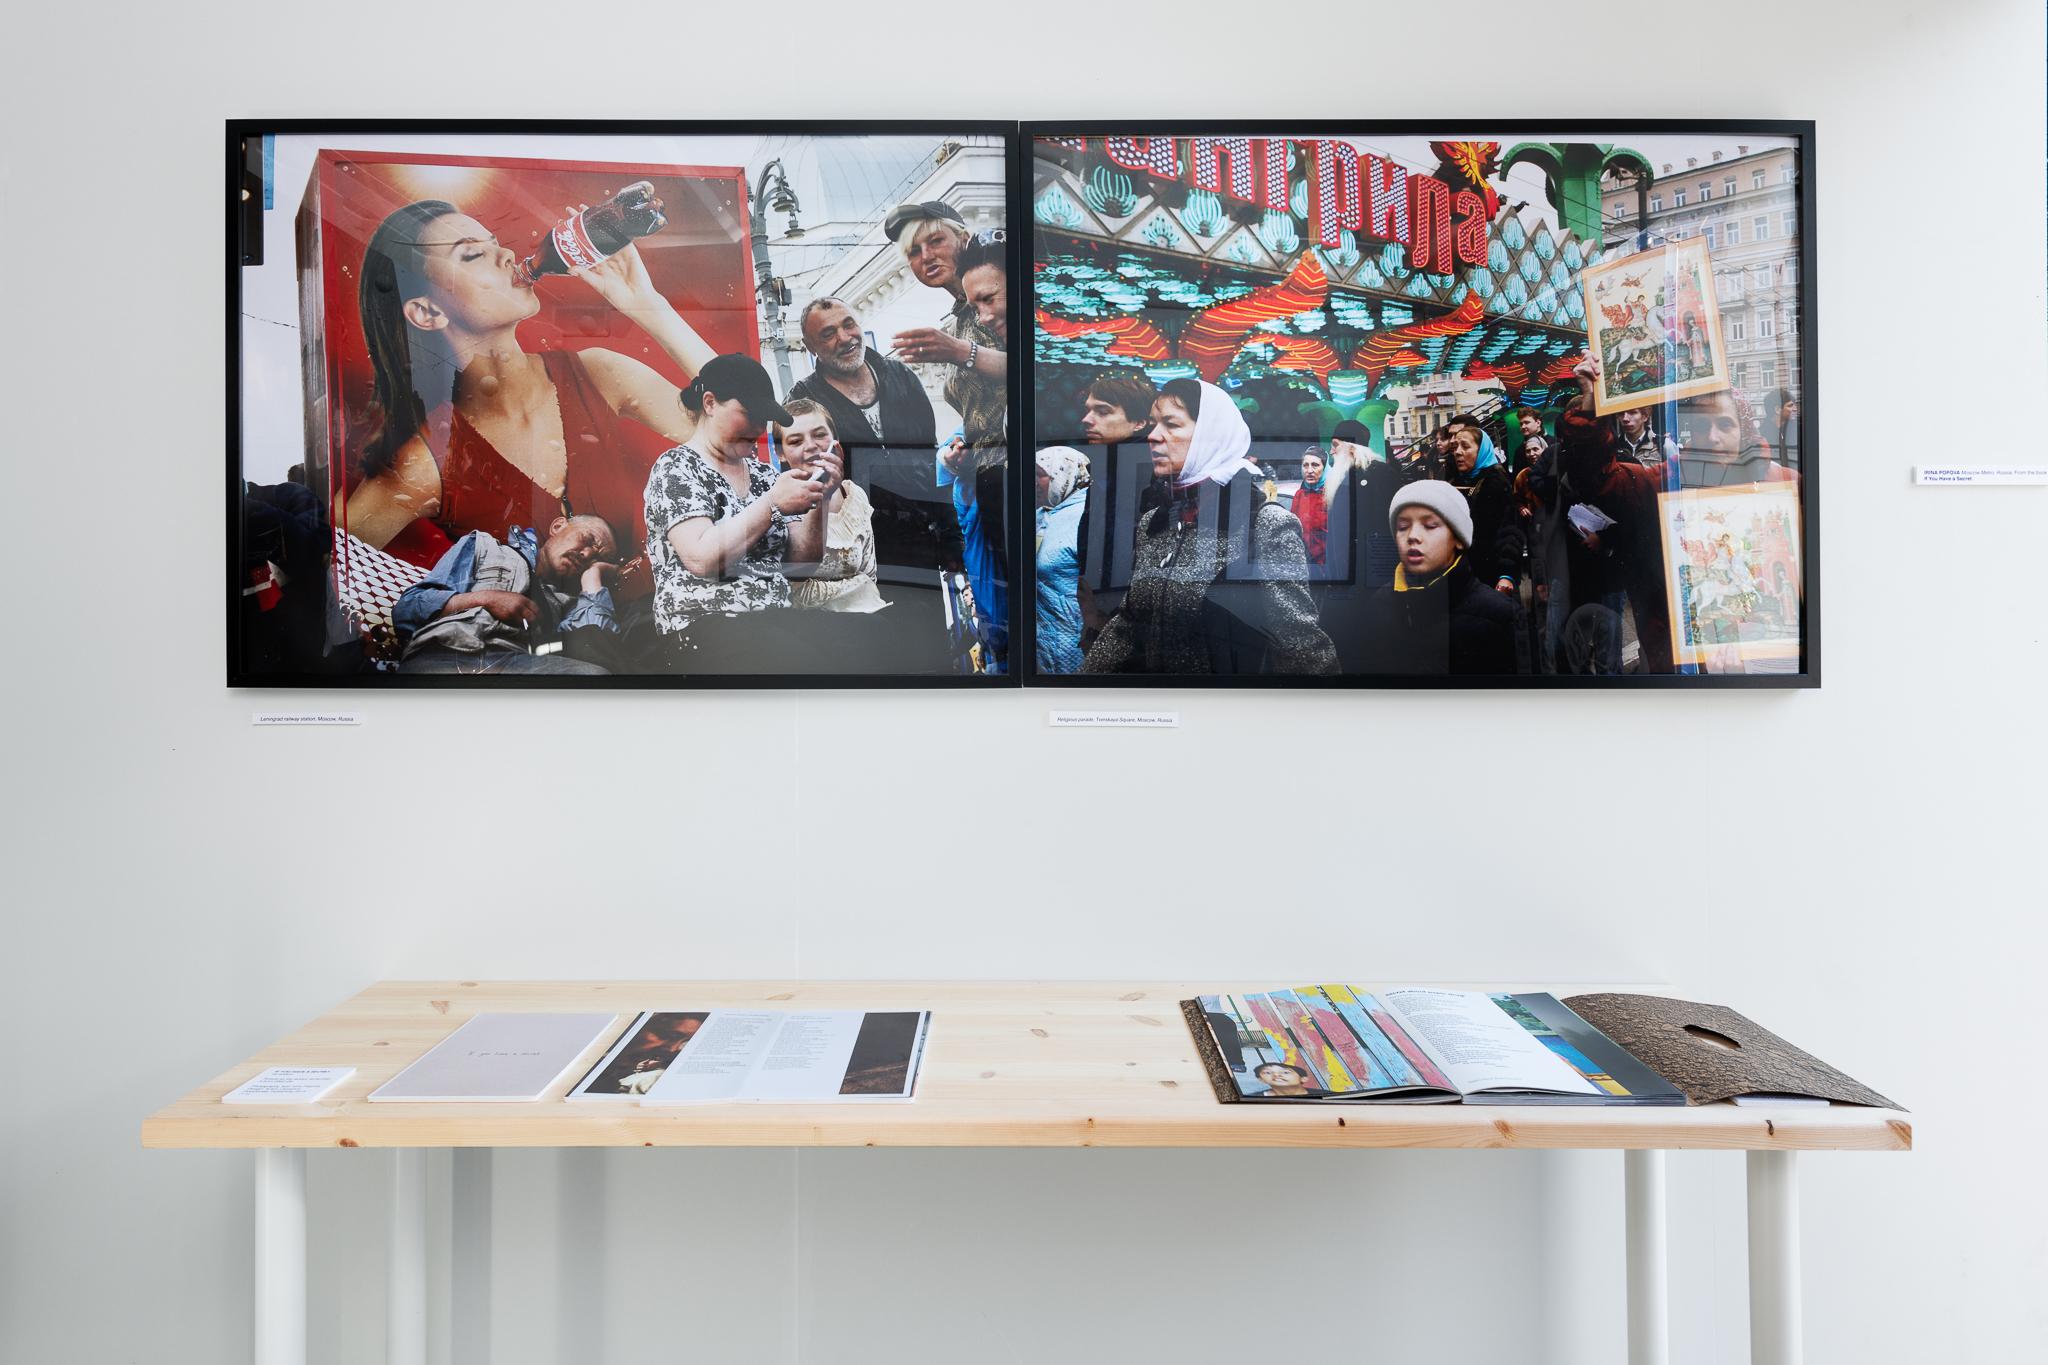 Fotobokfestival Oslo  2018